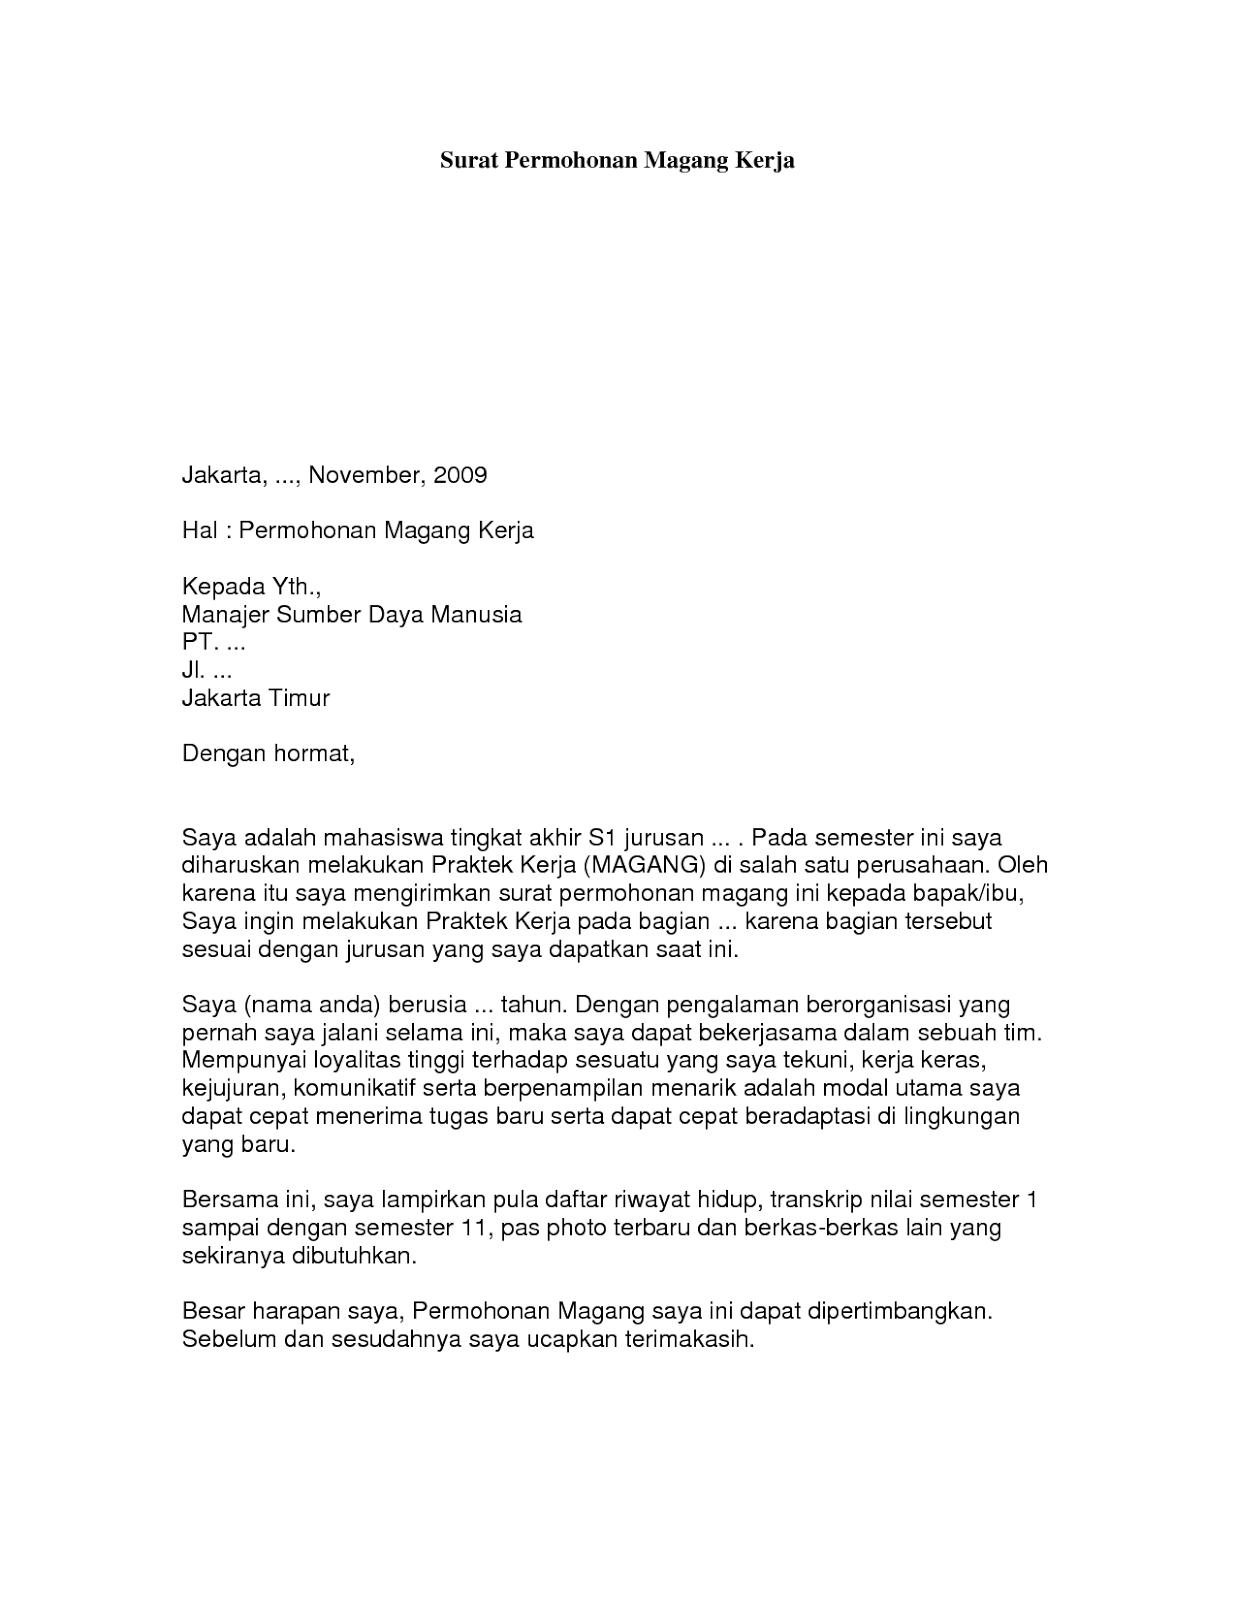 Surat Lamaran Kerja Magang ben jobs Surat, Bahasa, Hukum